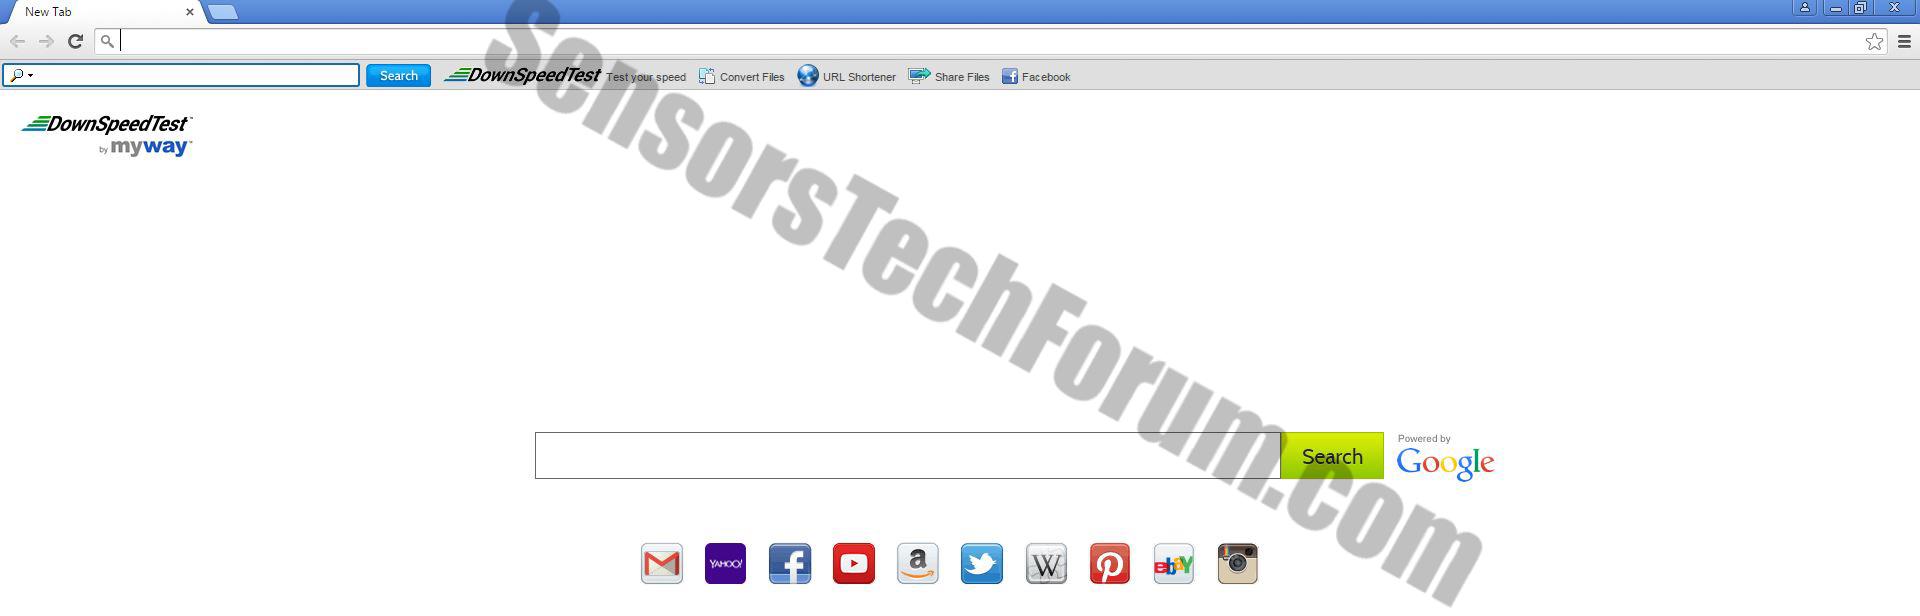 Downspeedtest-toolbar